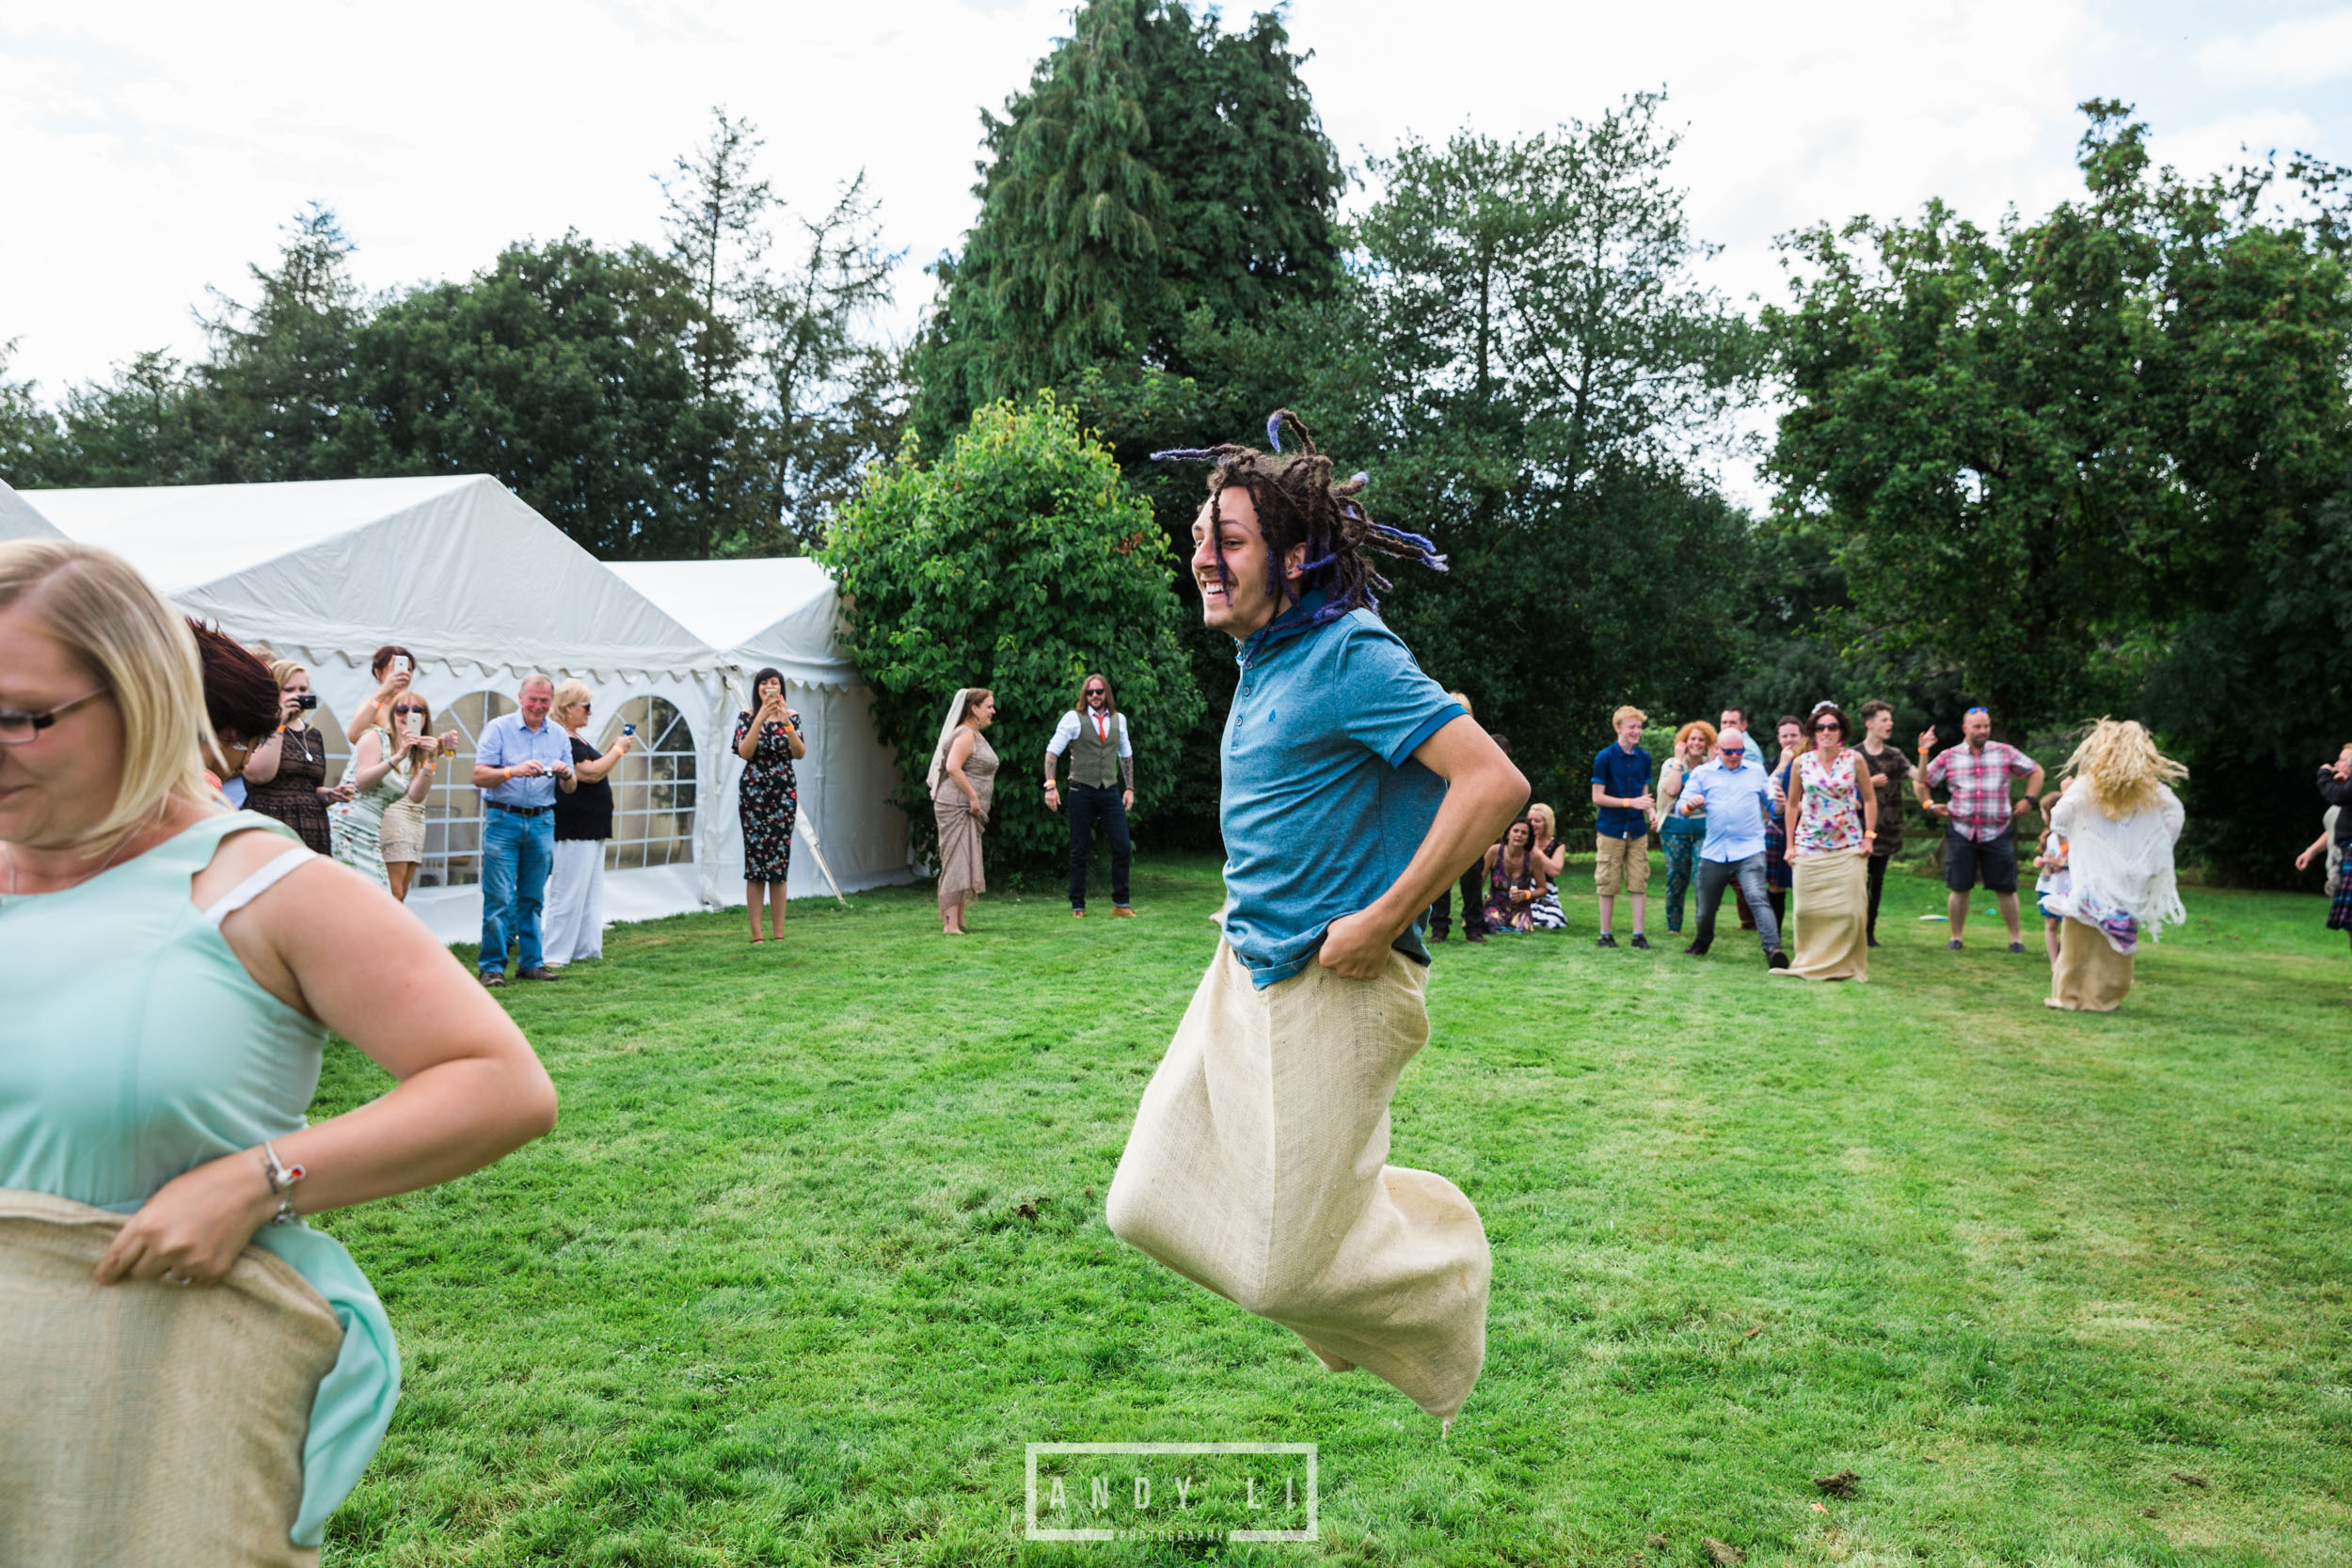 Festival Wedding Shropshire-Andy Li Photography-270.jpg